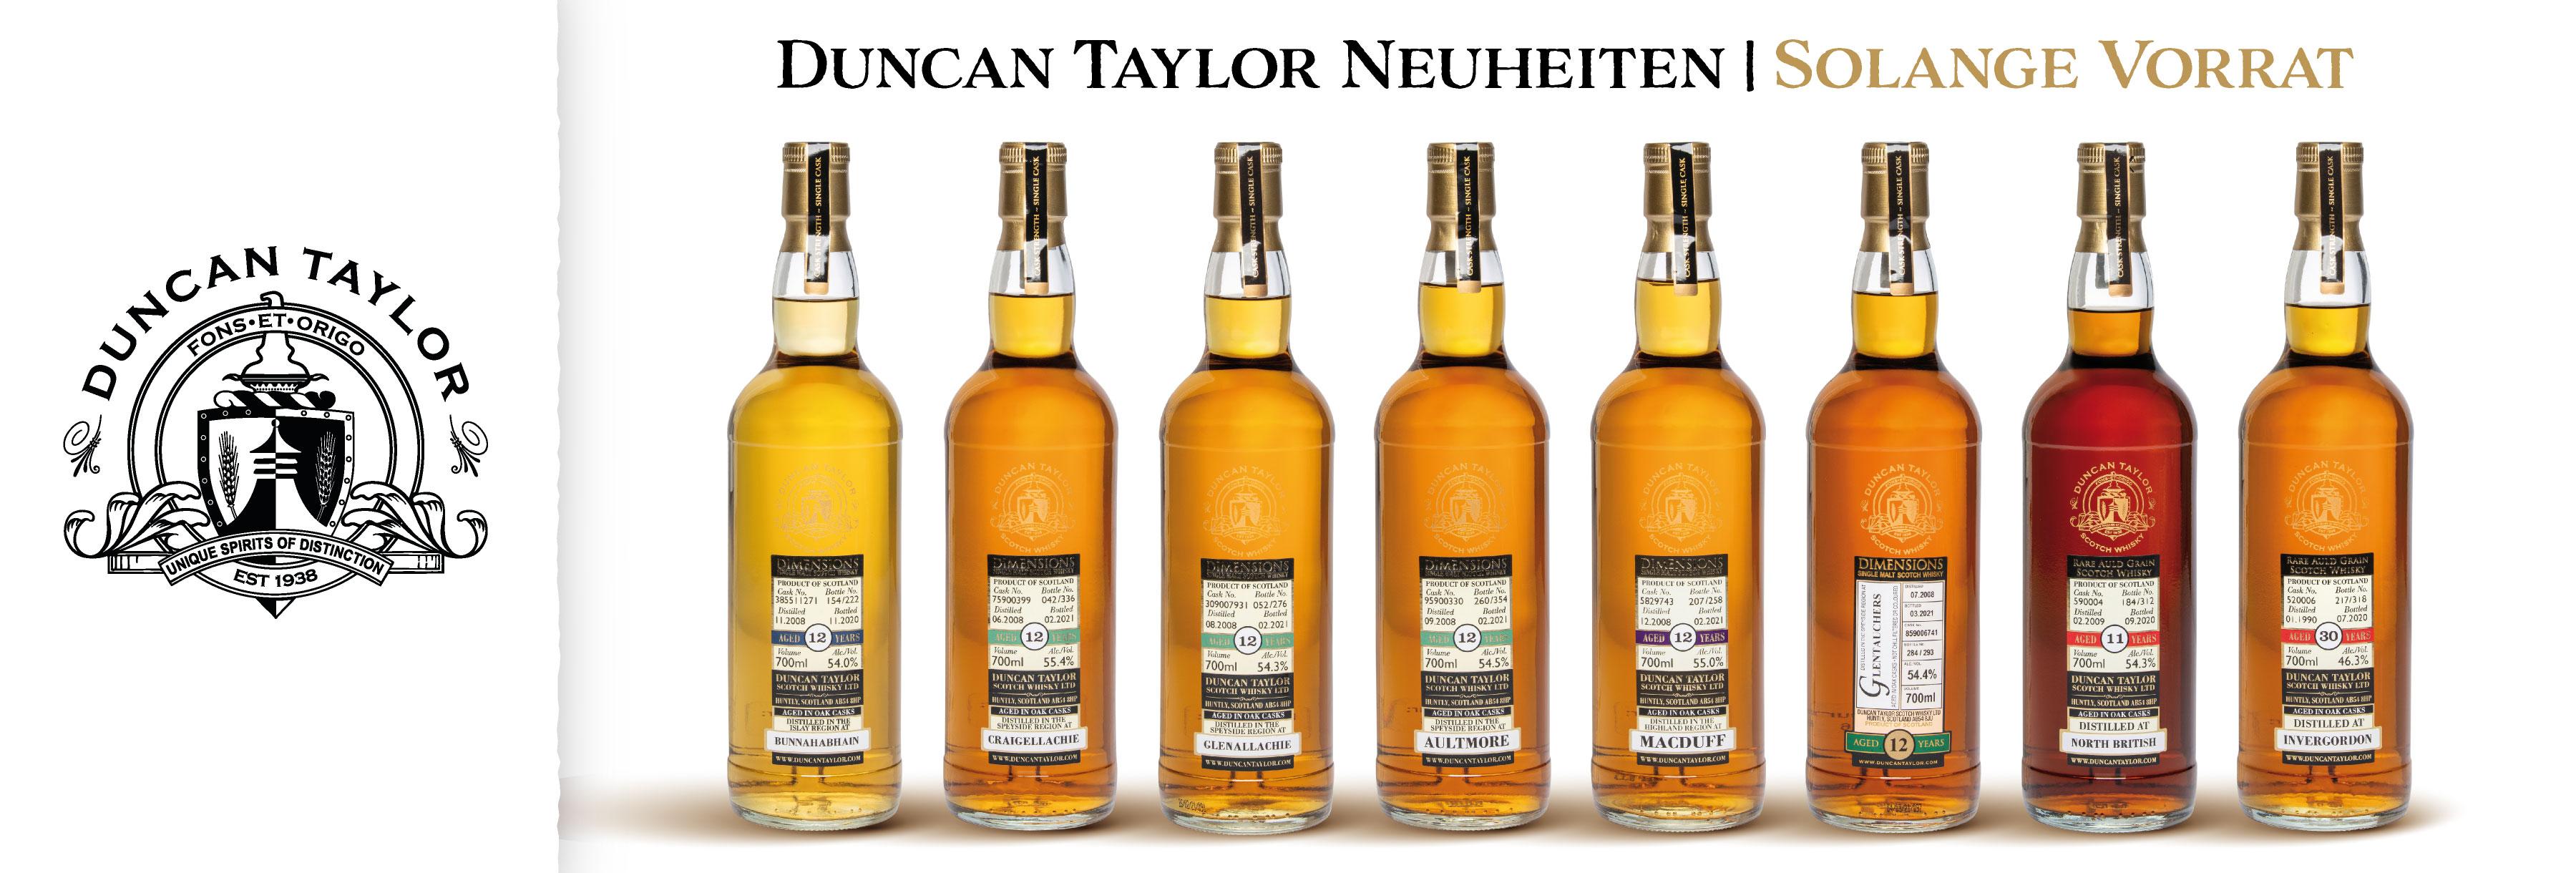 Duncan Taylor Single Cask Neuheiten Juni 2021 Glen Fahrn Whisky Whiskies Rare Günstig